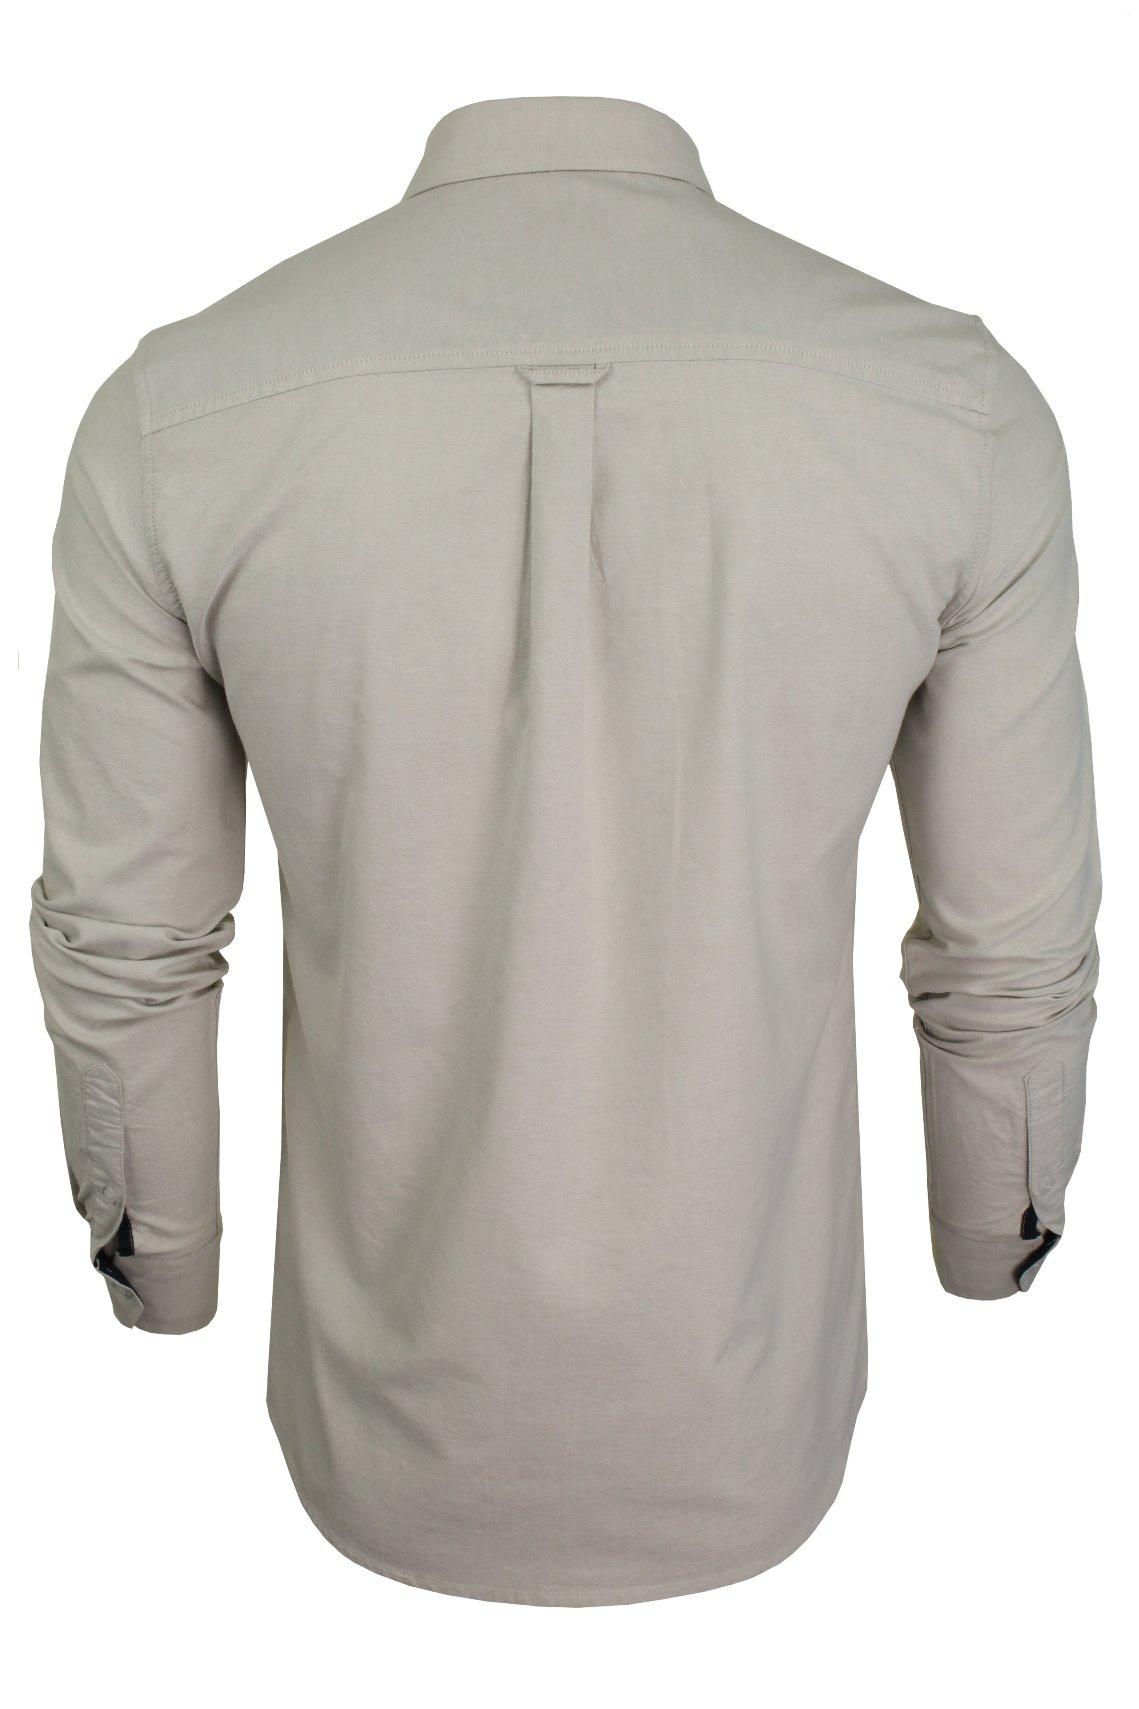 Xact-Long-Sleeved-Oxford-Shirt thumbnail 11